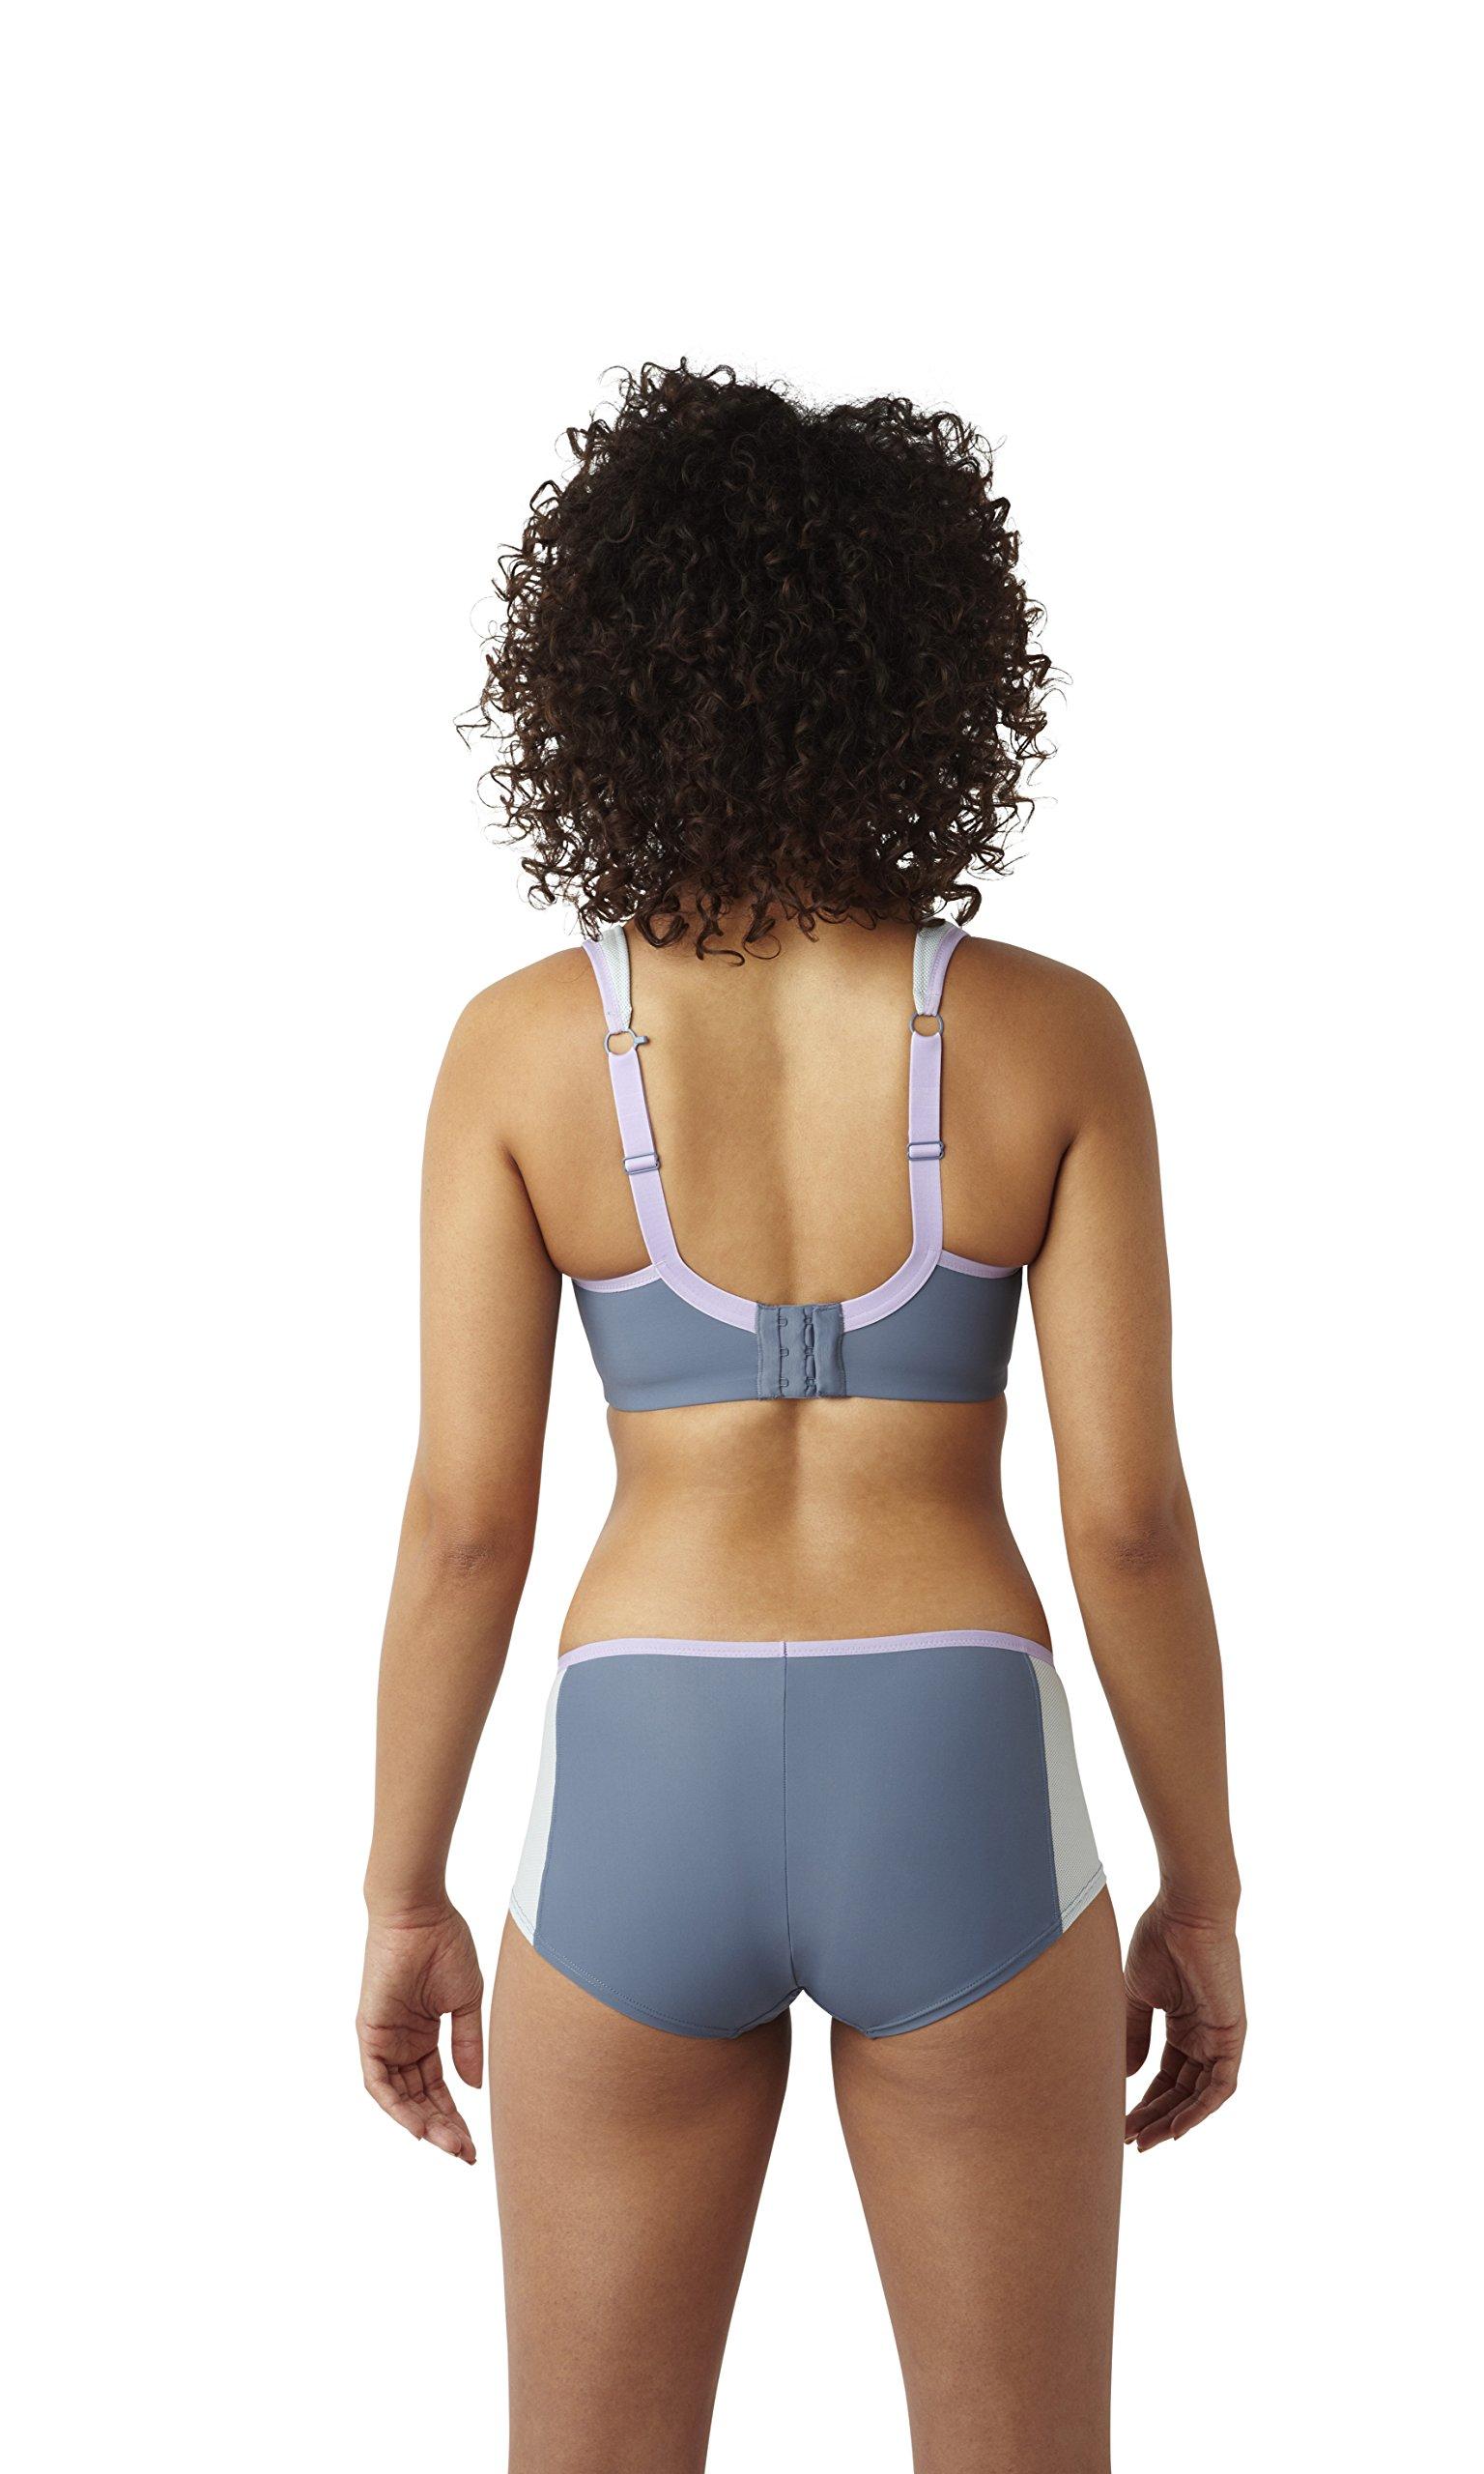 Panache Women's Plus Size Wired Sports Bra, Grey 28DD by Panache (Image #5)